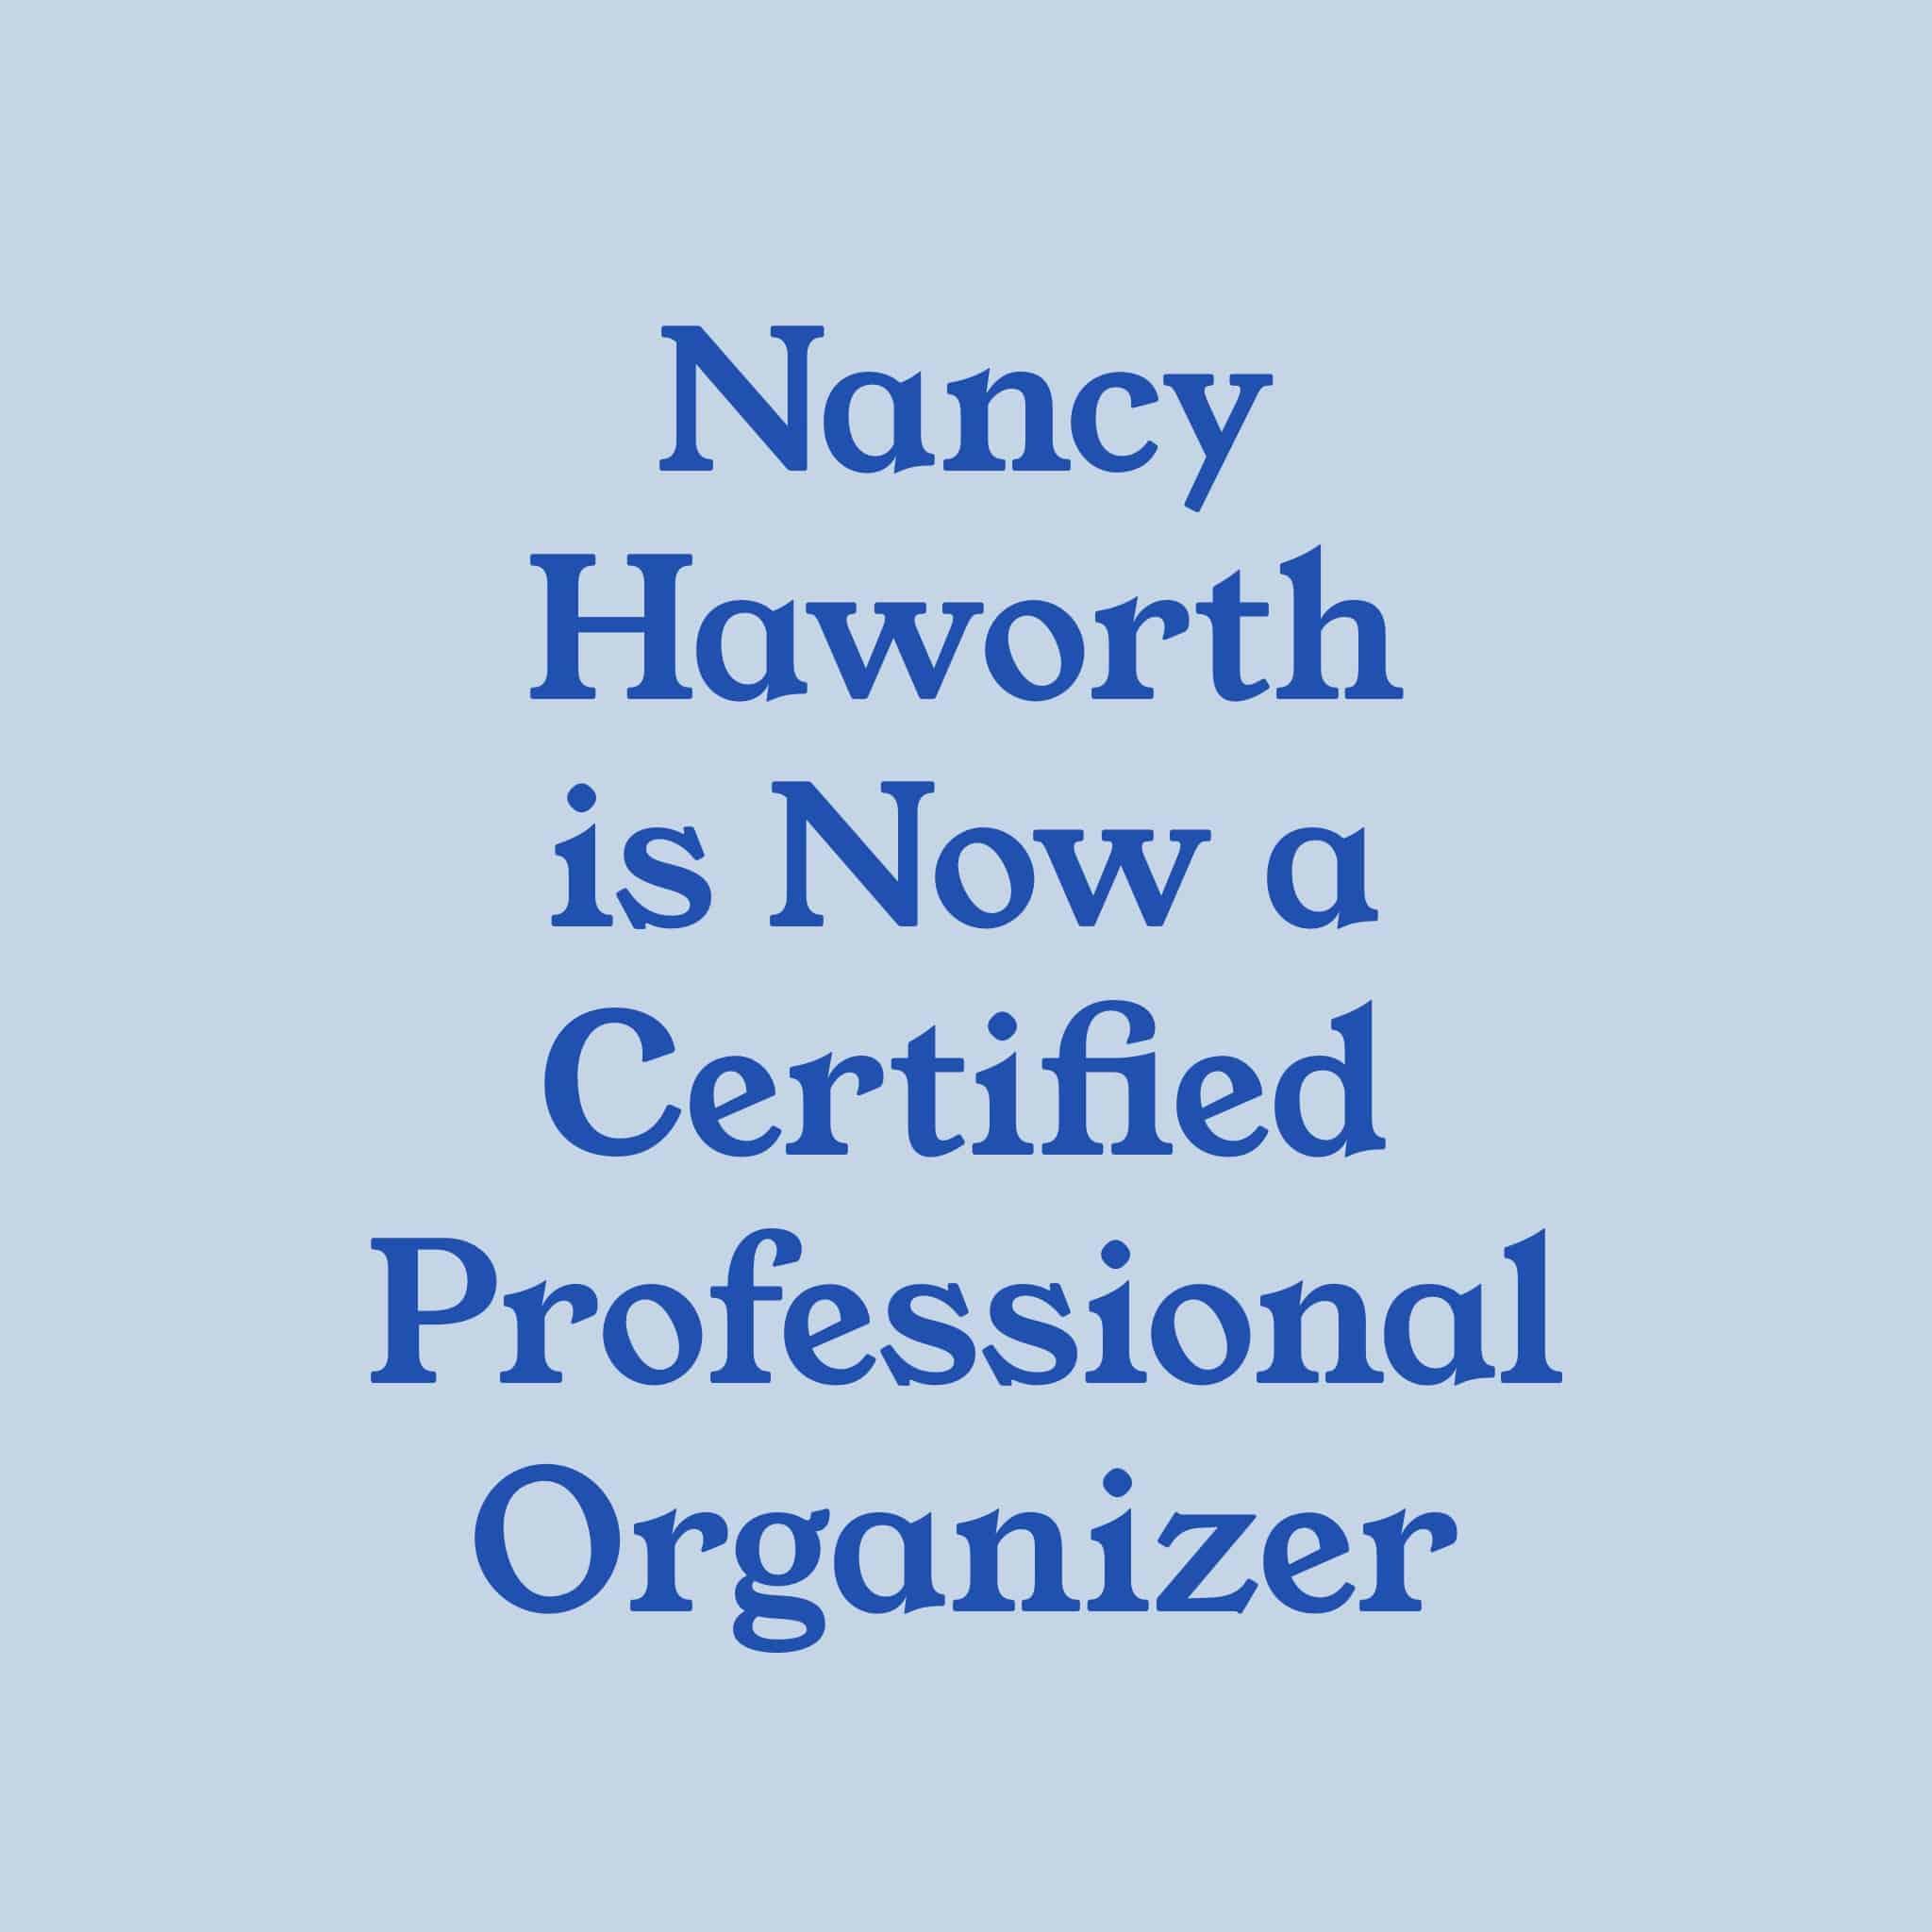 Nancy Haworth is Now a Certified Professional Organizer